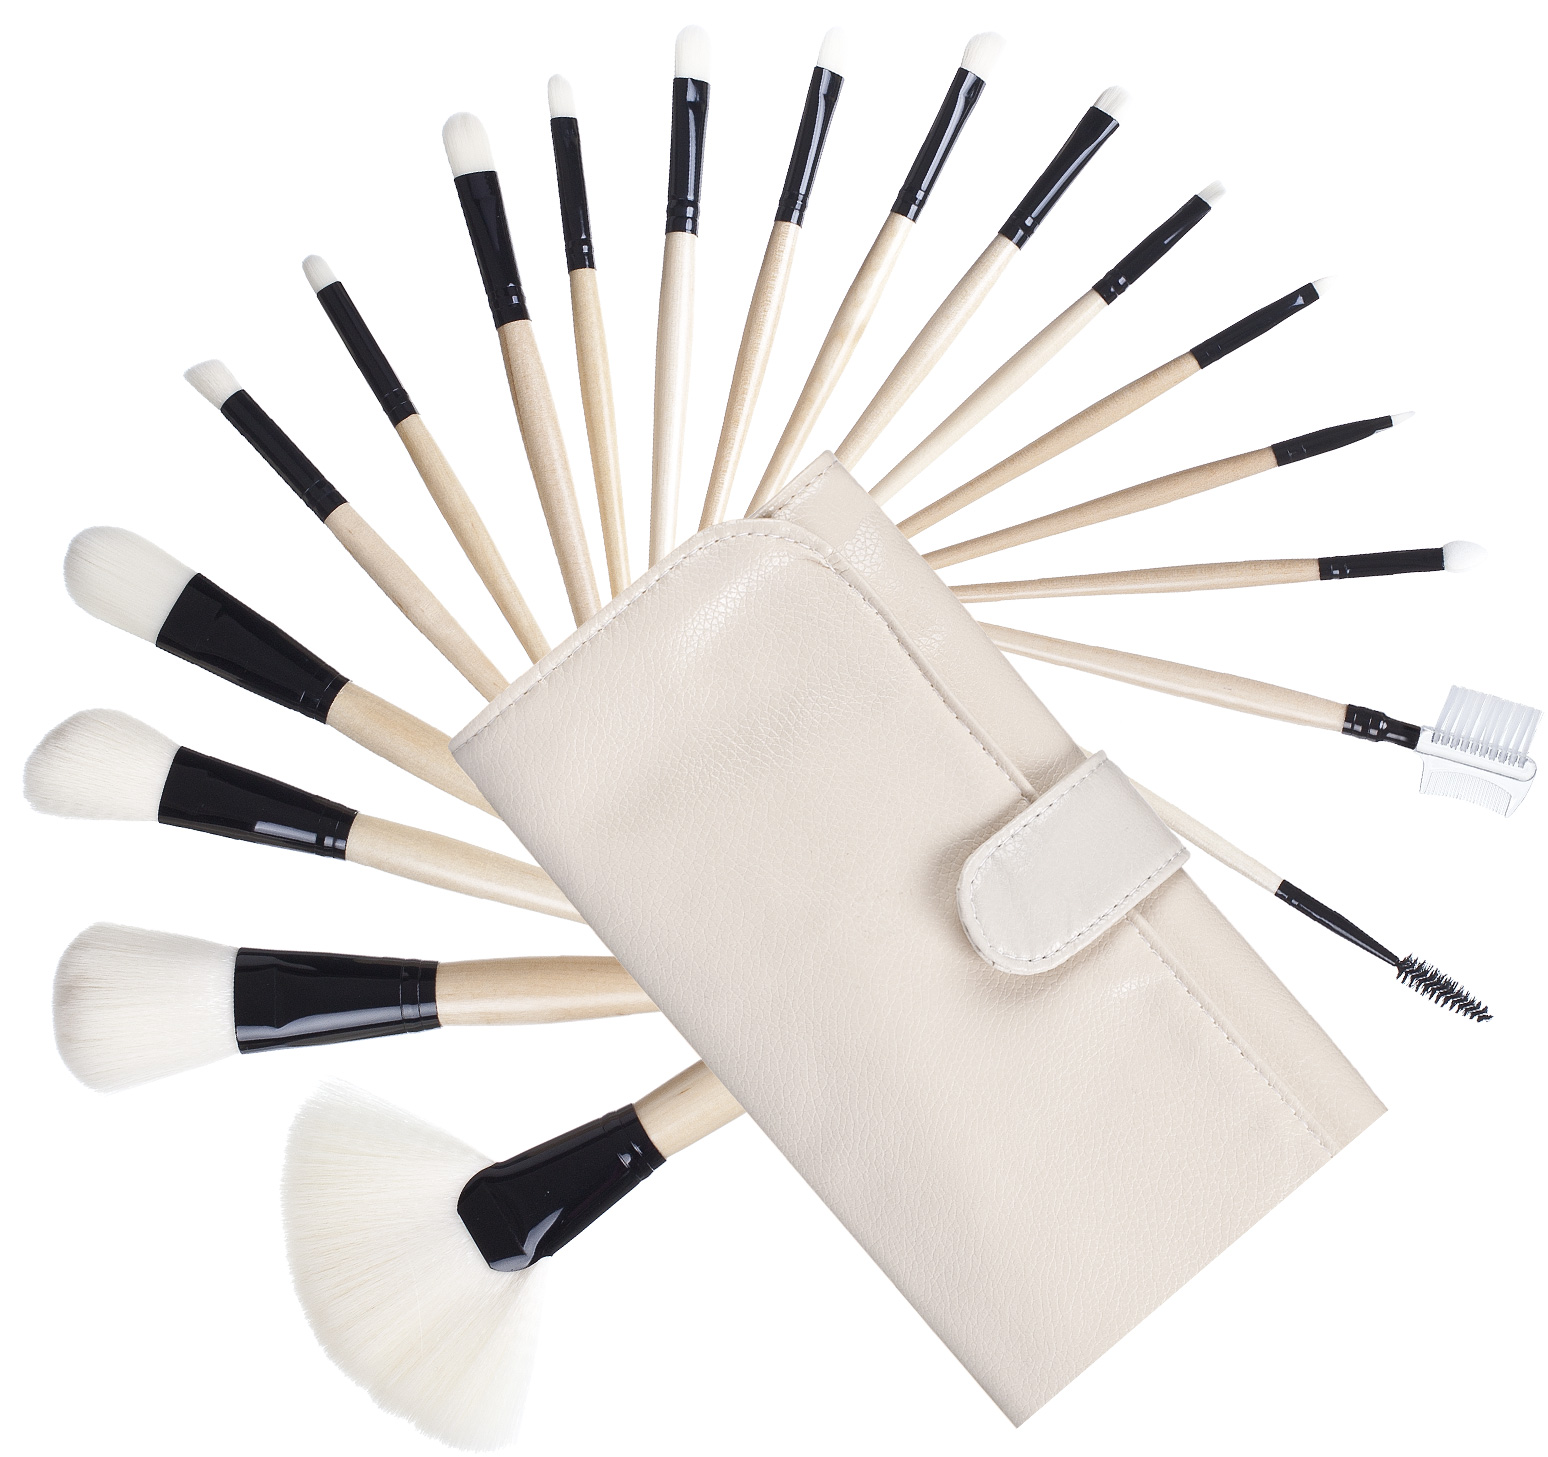 18tlg veledia kosmetik pinsel set make up synthetik brush. Black Bedroom Furniture Sets. Home Design Ideas